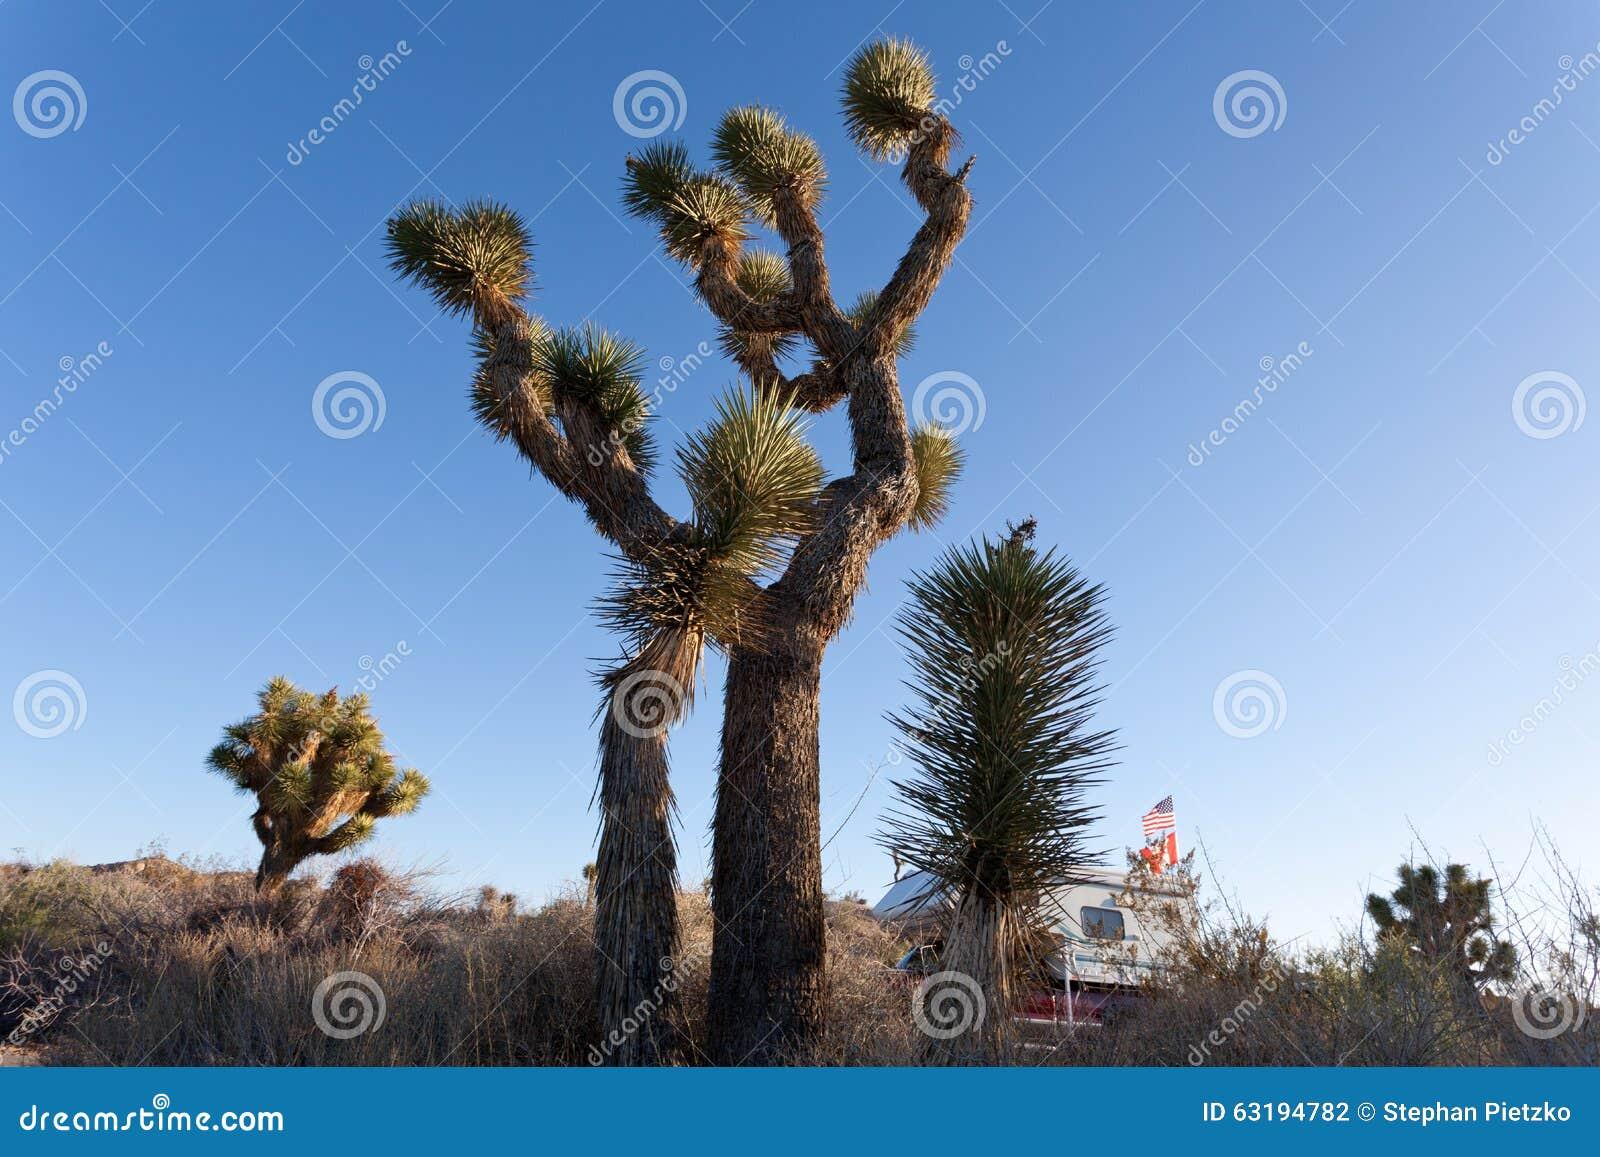 Rv Camping In Joshua Tree National Park California Usa Stock